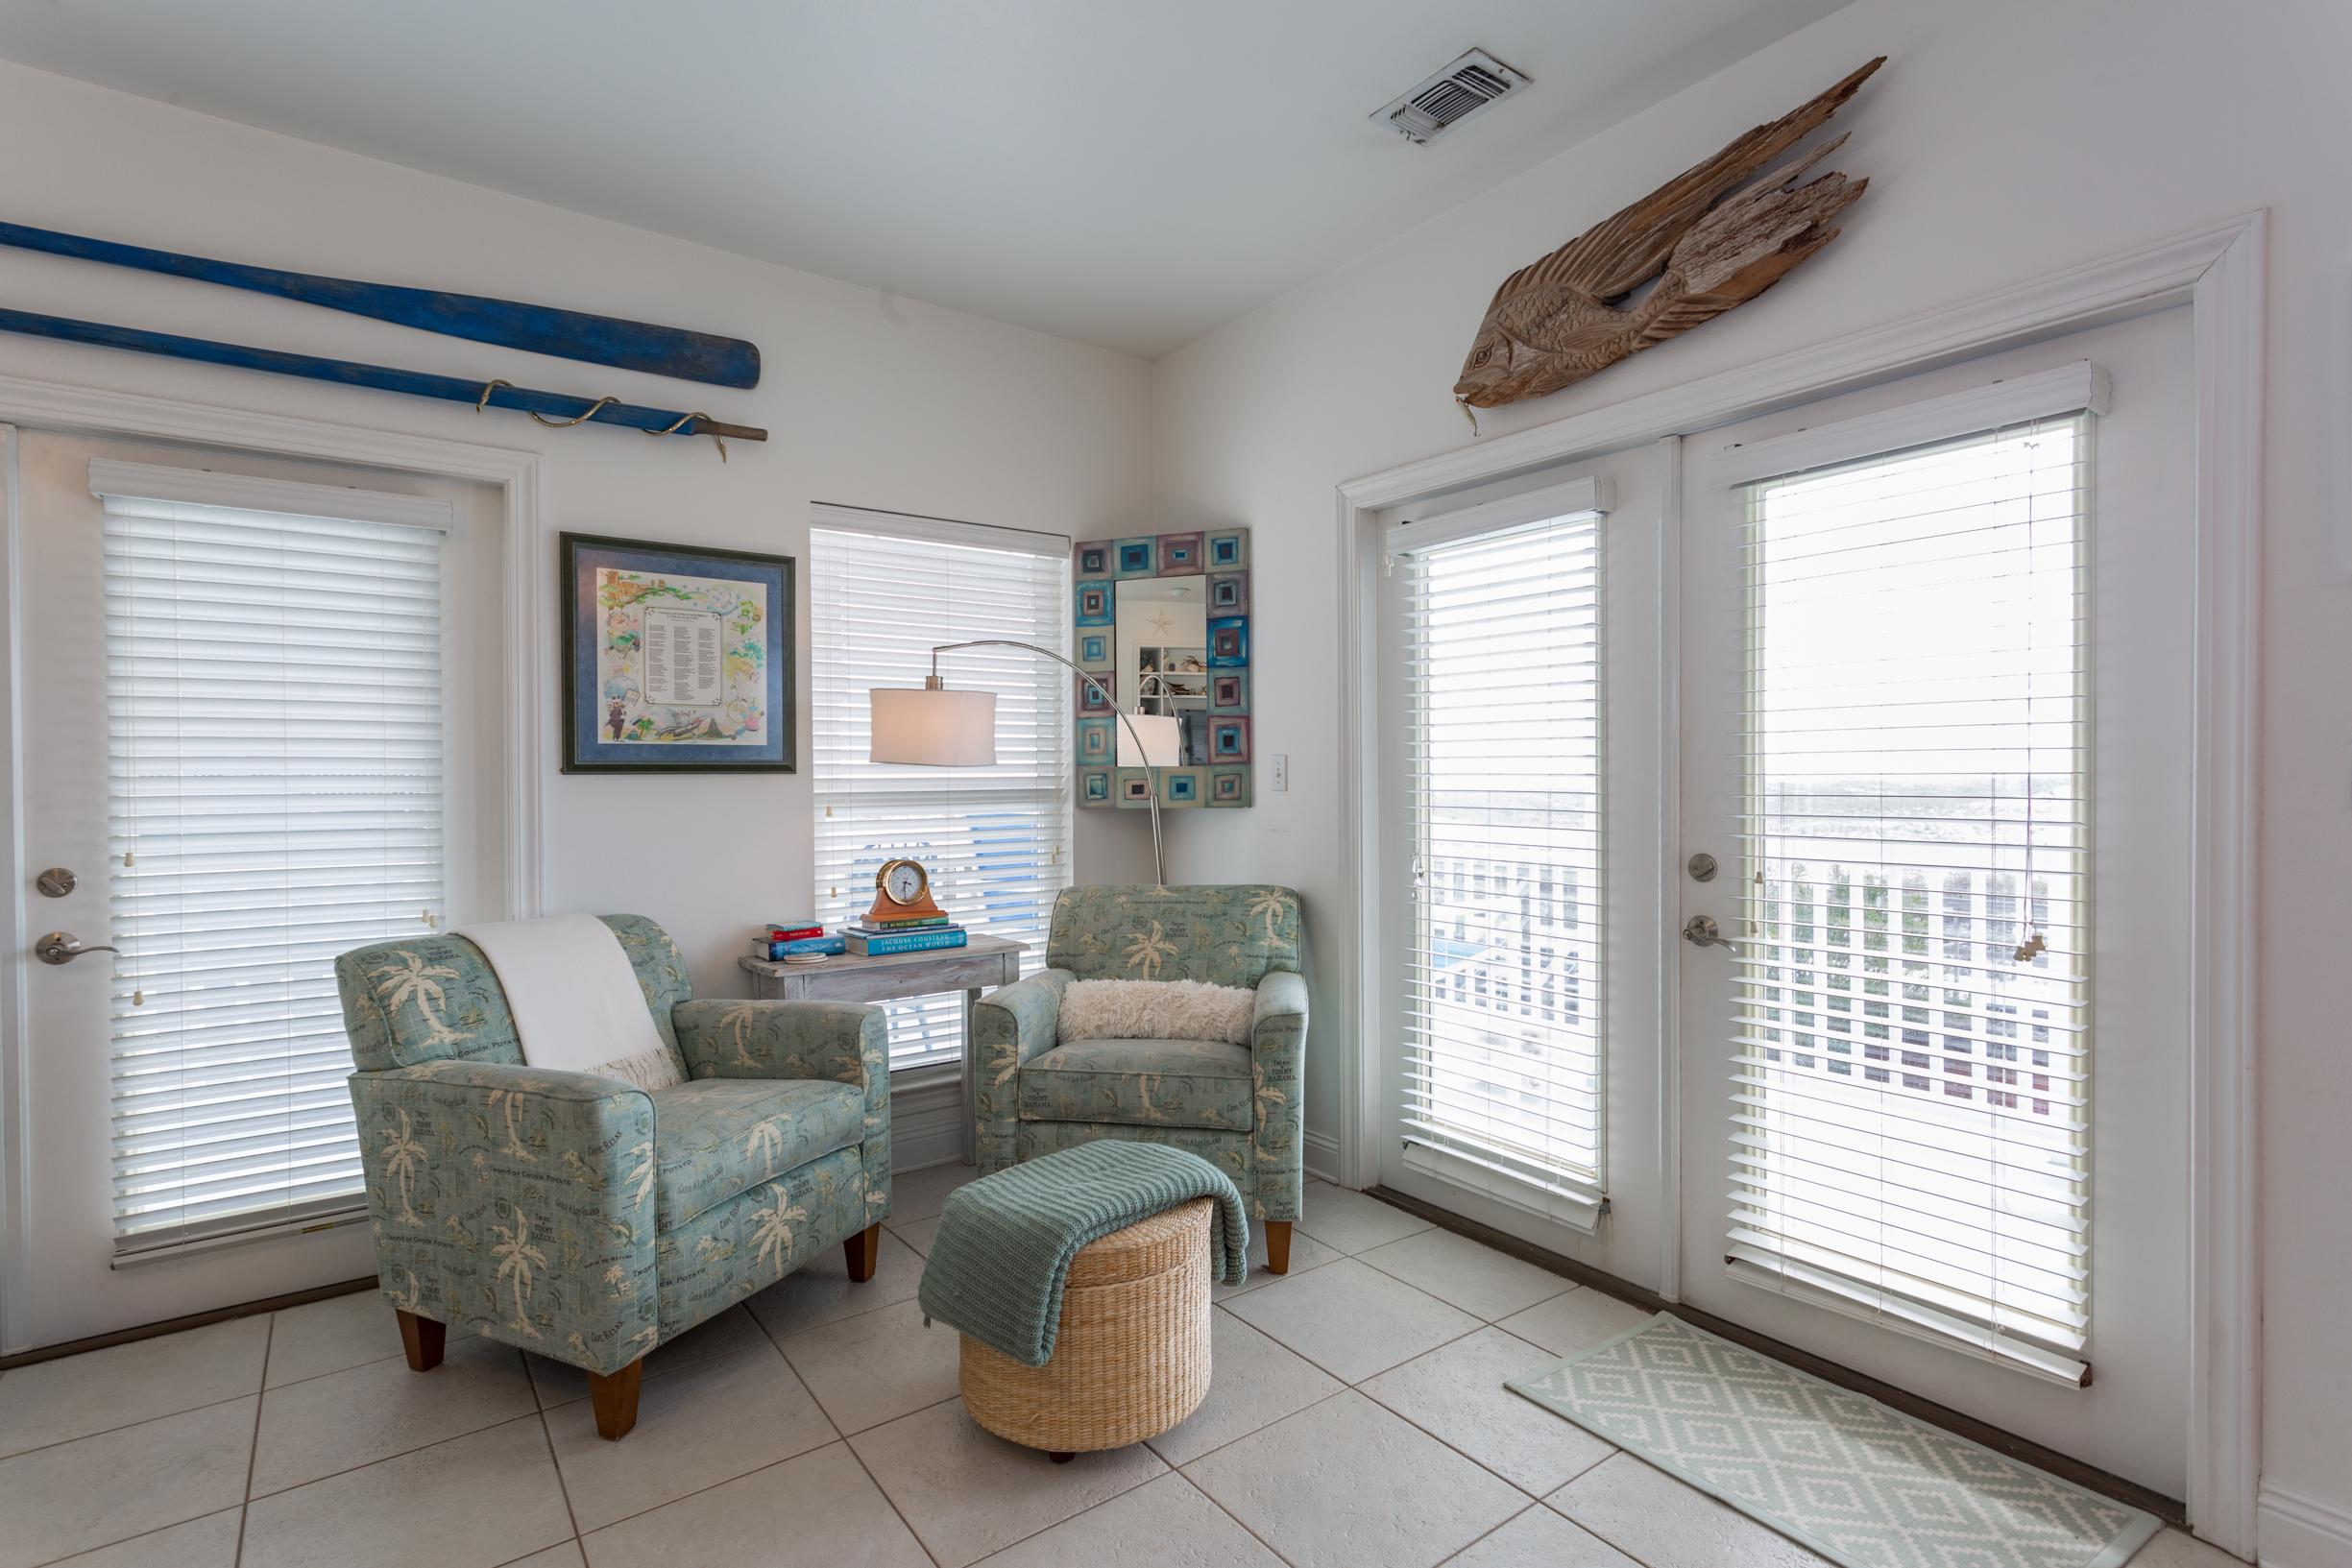 White Sands Cottage 501 Life's a Beach House Townhouse rental in White Sands Pensacola Beach in Pensacola Beach Florida - #14